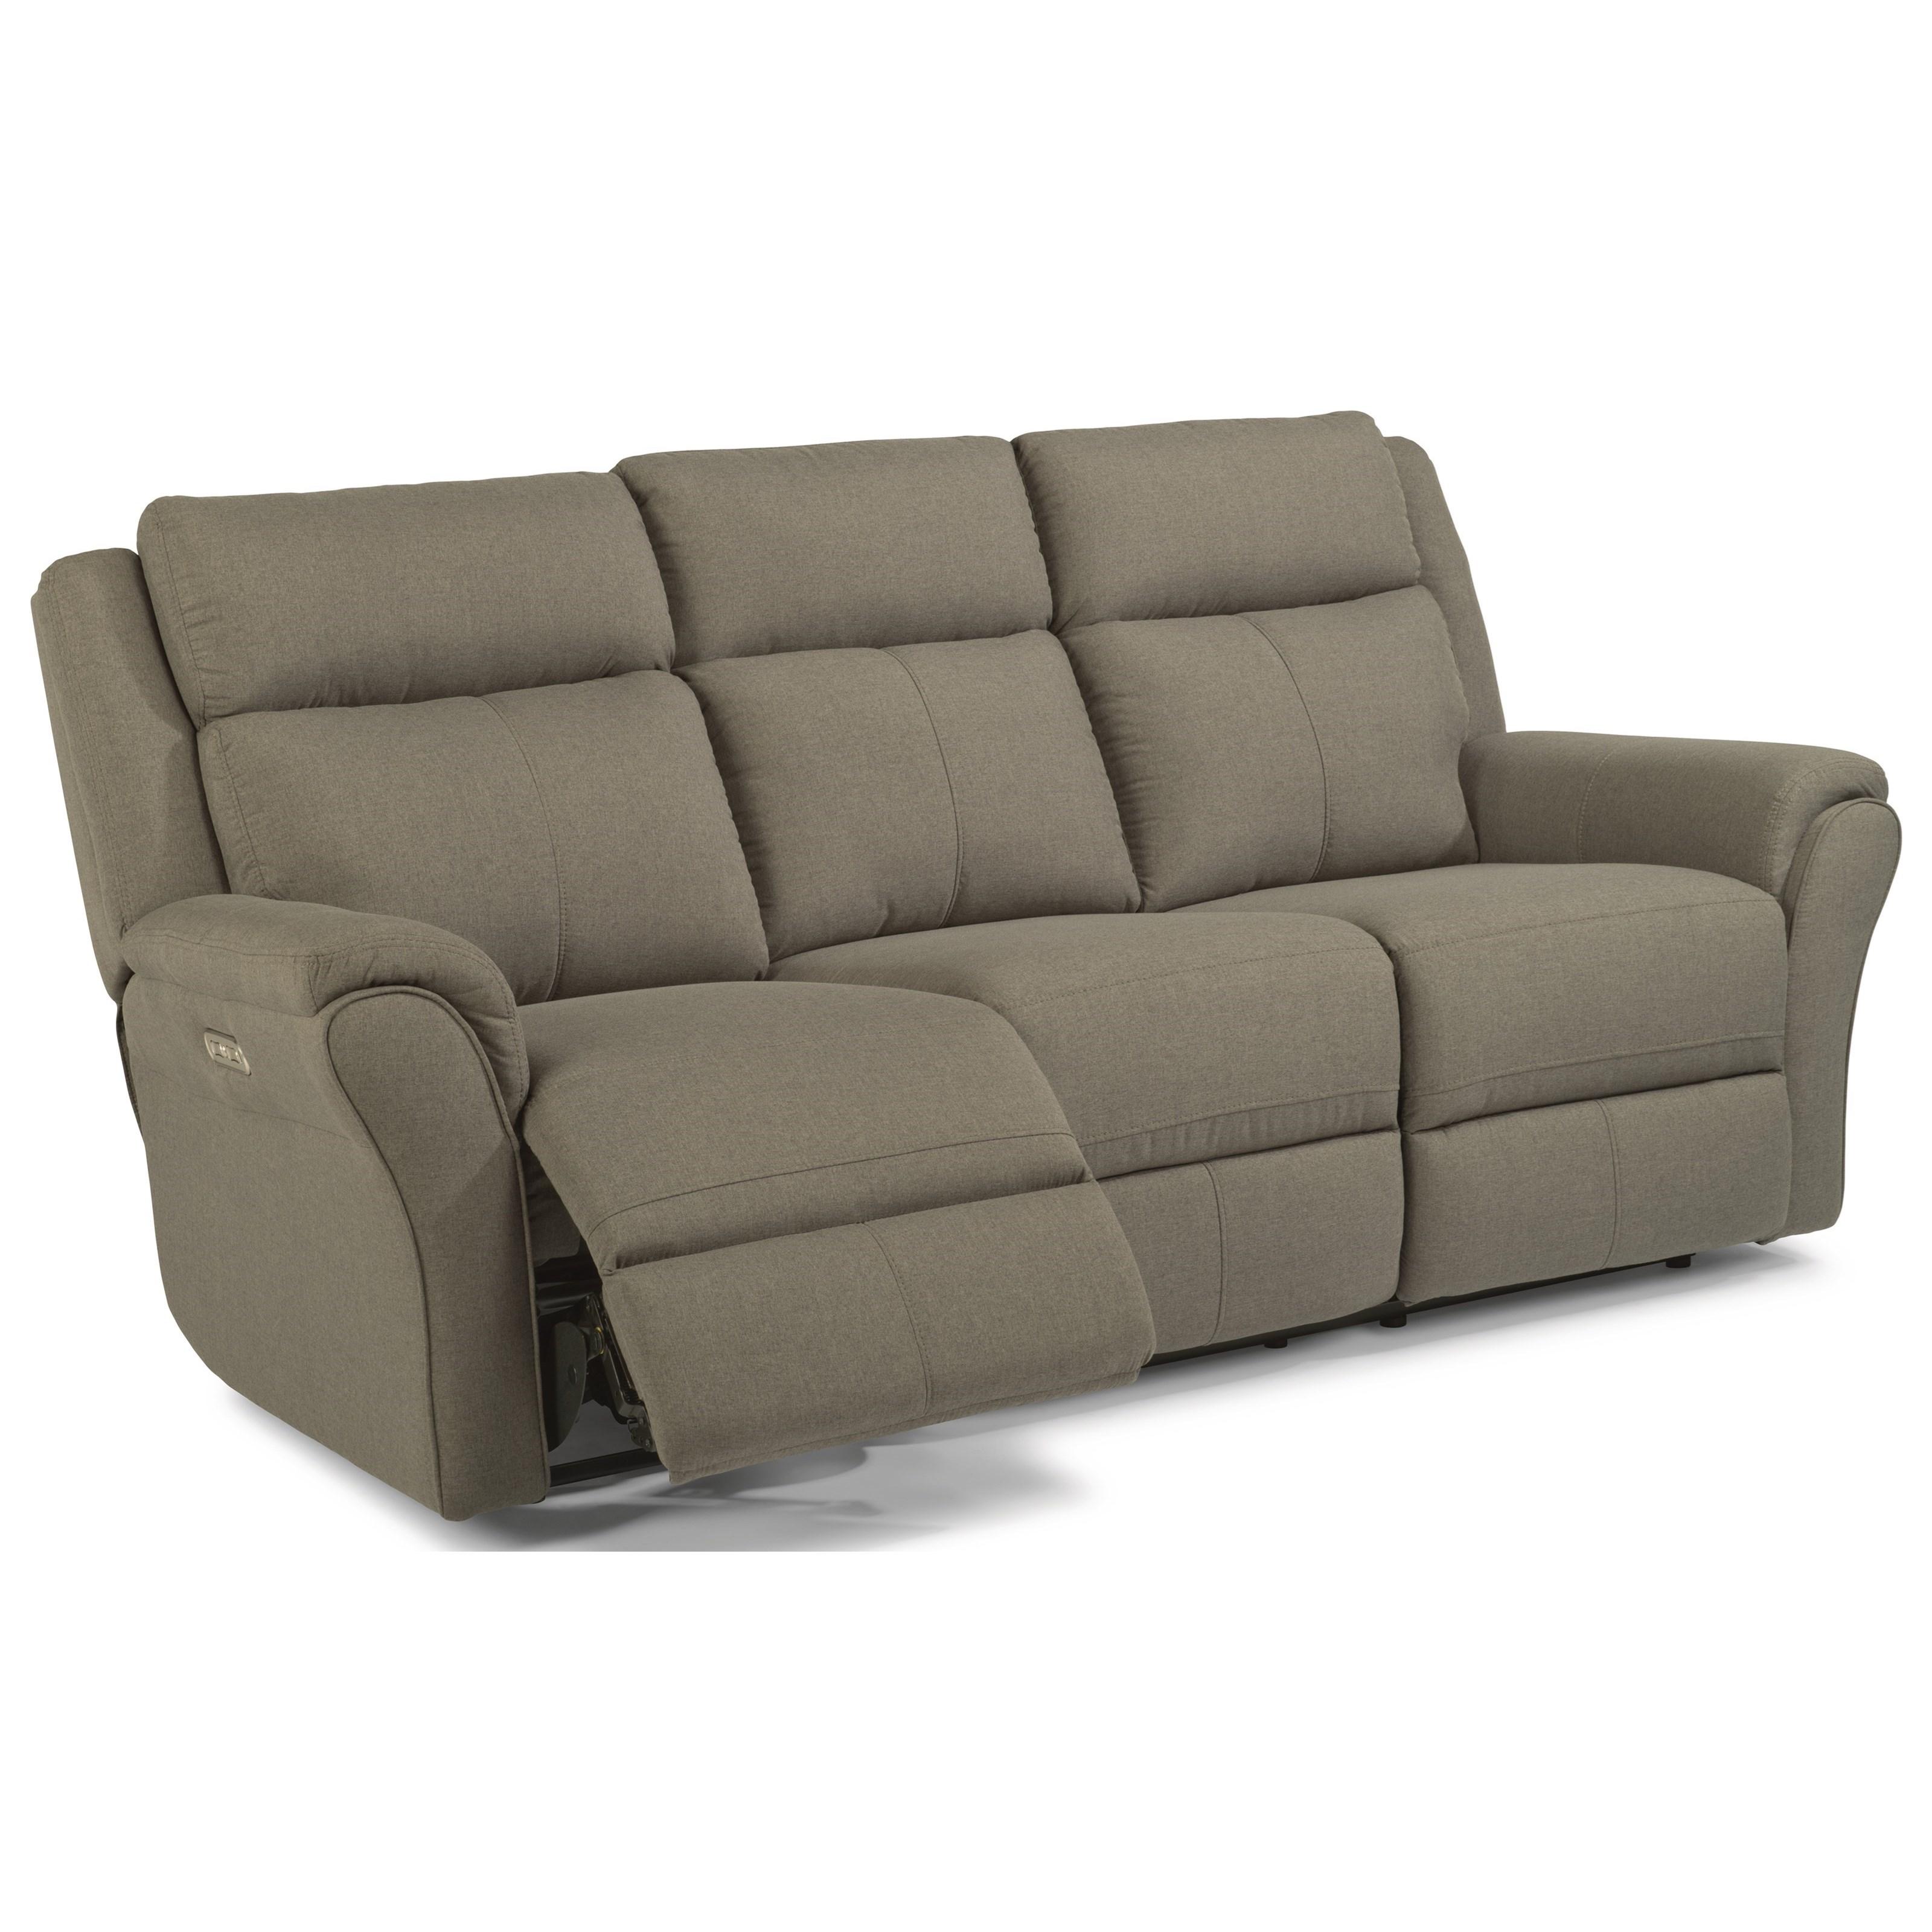 Flexsteel Sofa Bed Mattress: Flexsteel Latitudes-Pike Casual Power Reclining Sofa With